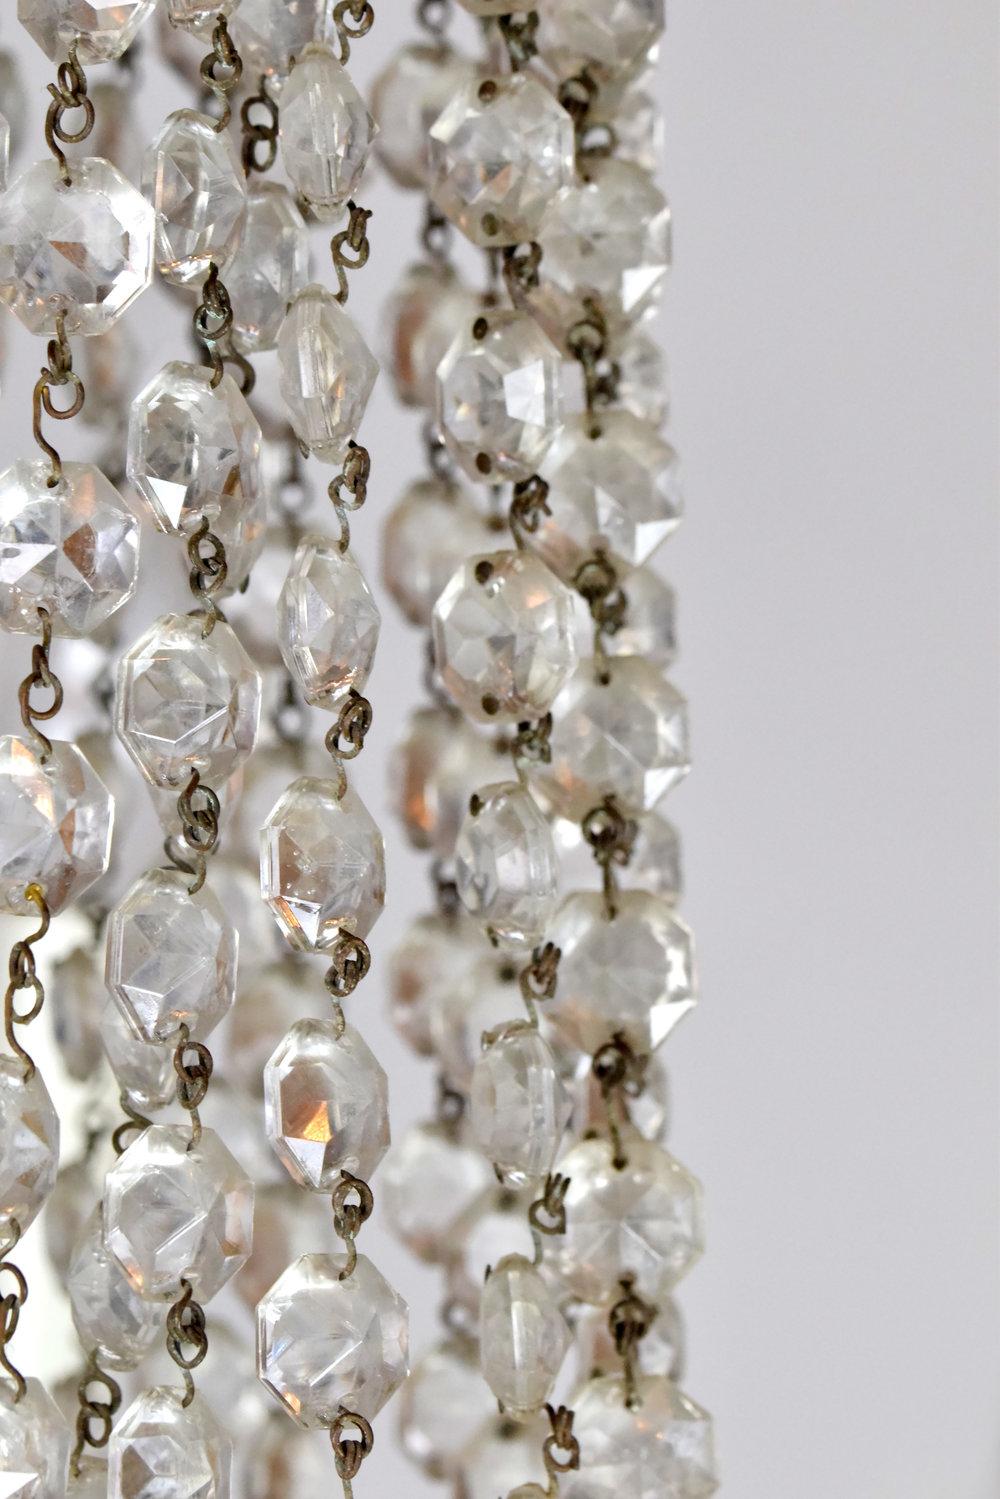 47666-12-light-crystal-chandelier-closeup-crystal.jpg